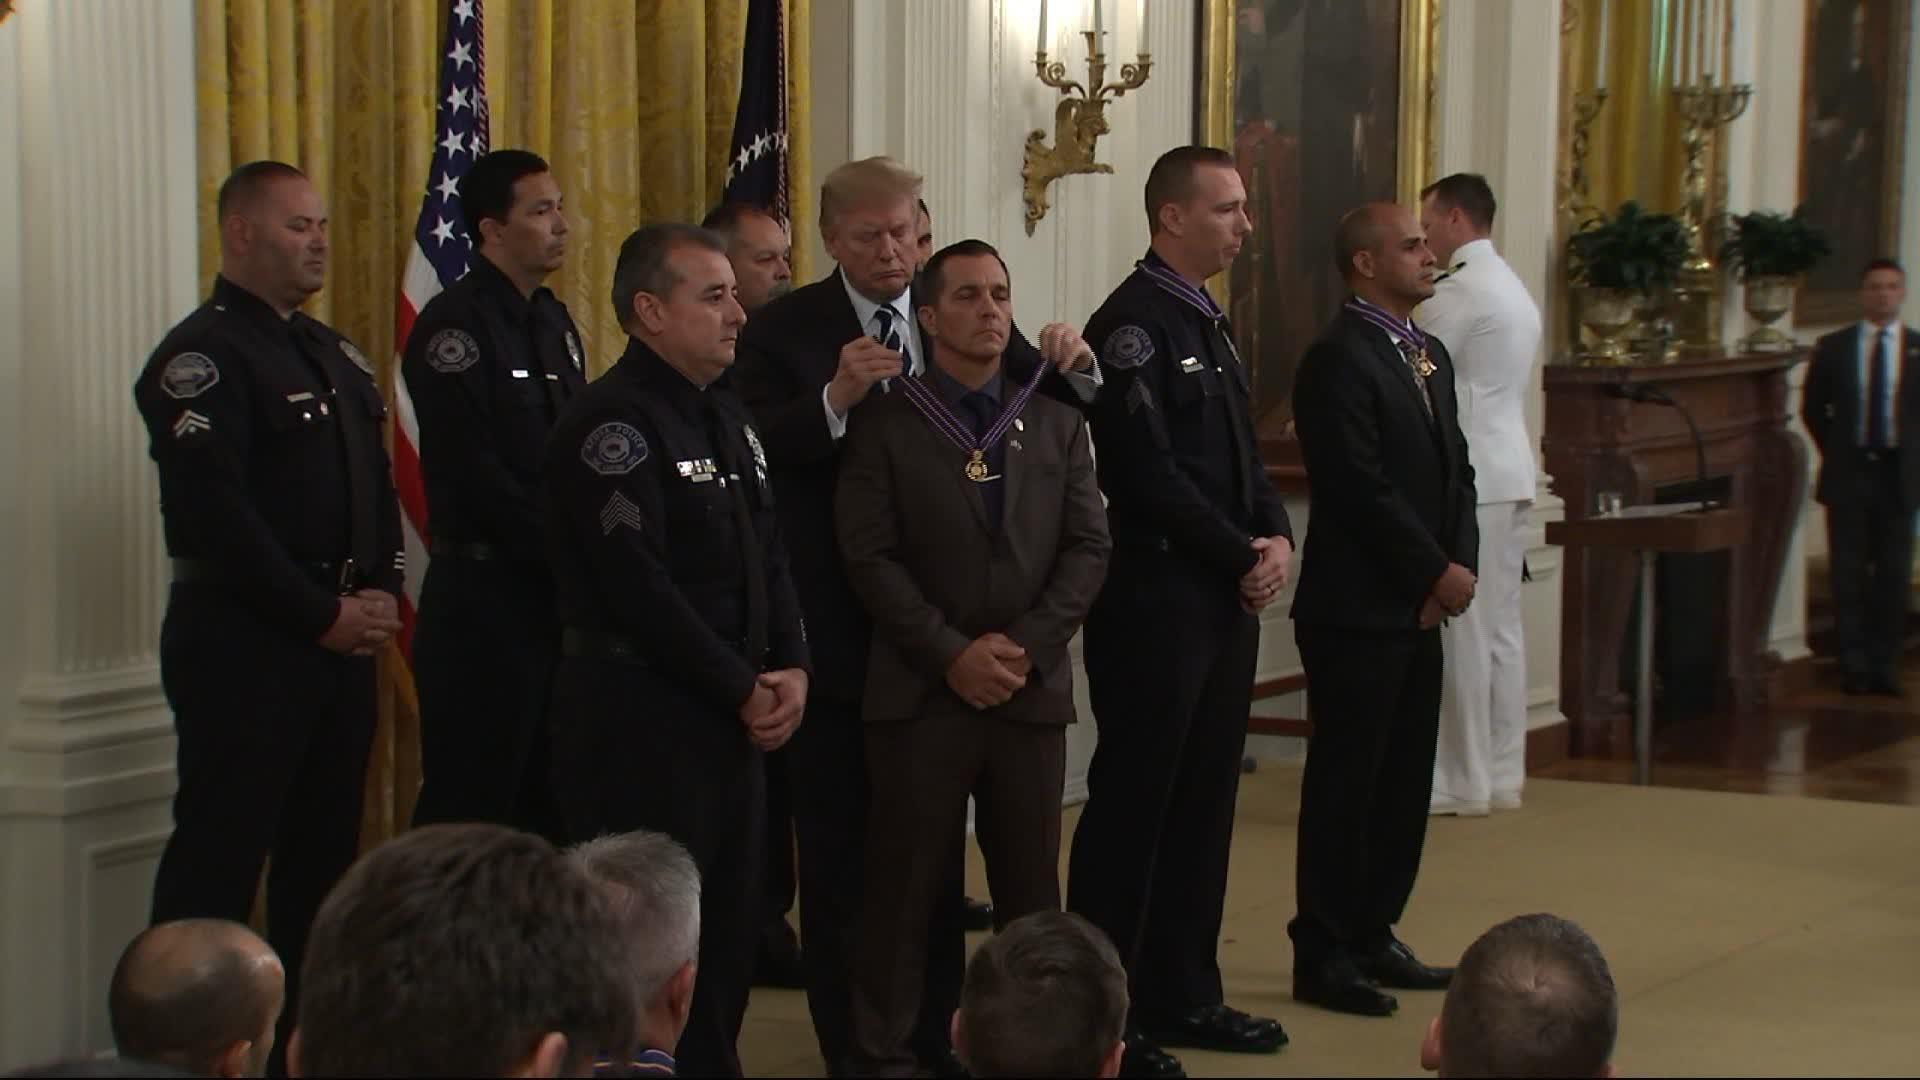 Oregon State Police trooper Nicholas Cederberg awarded Medal